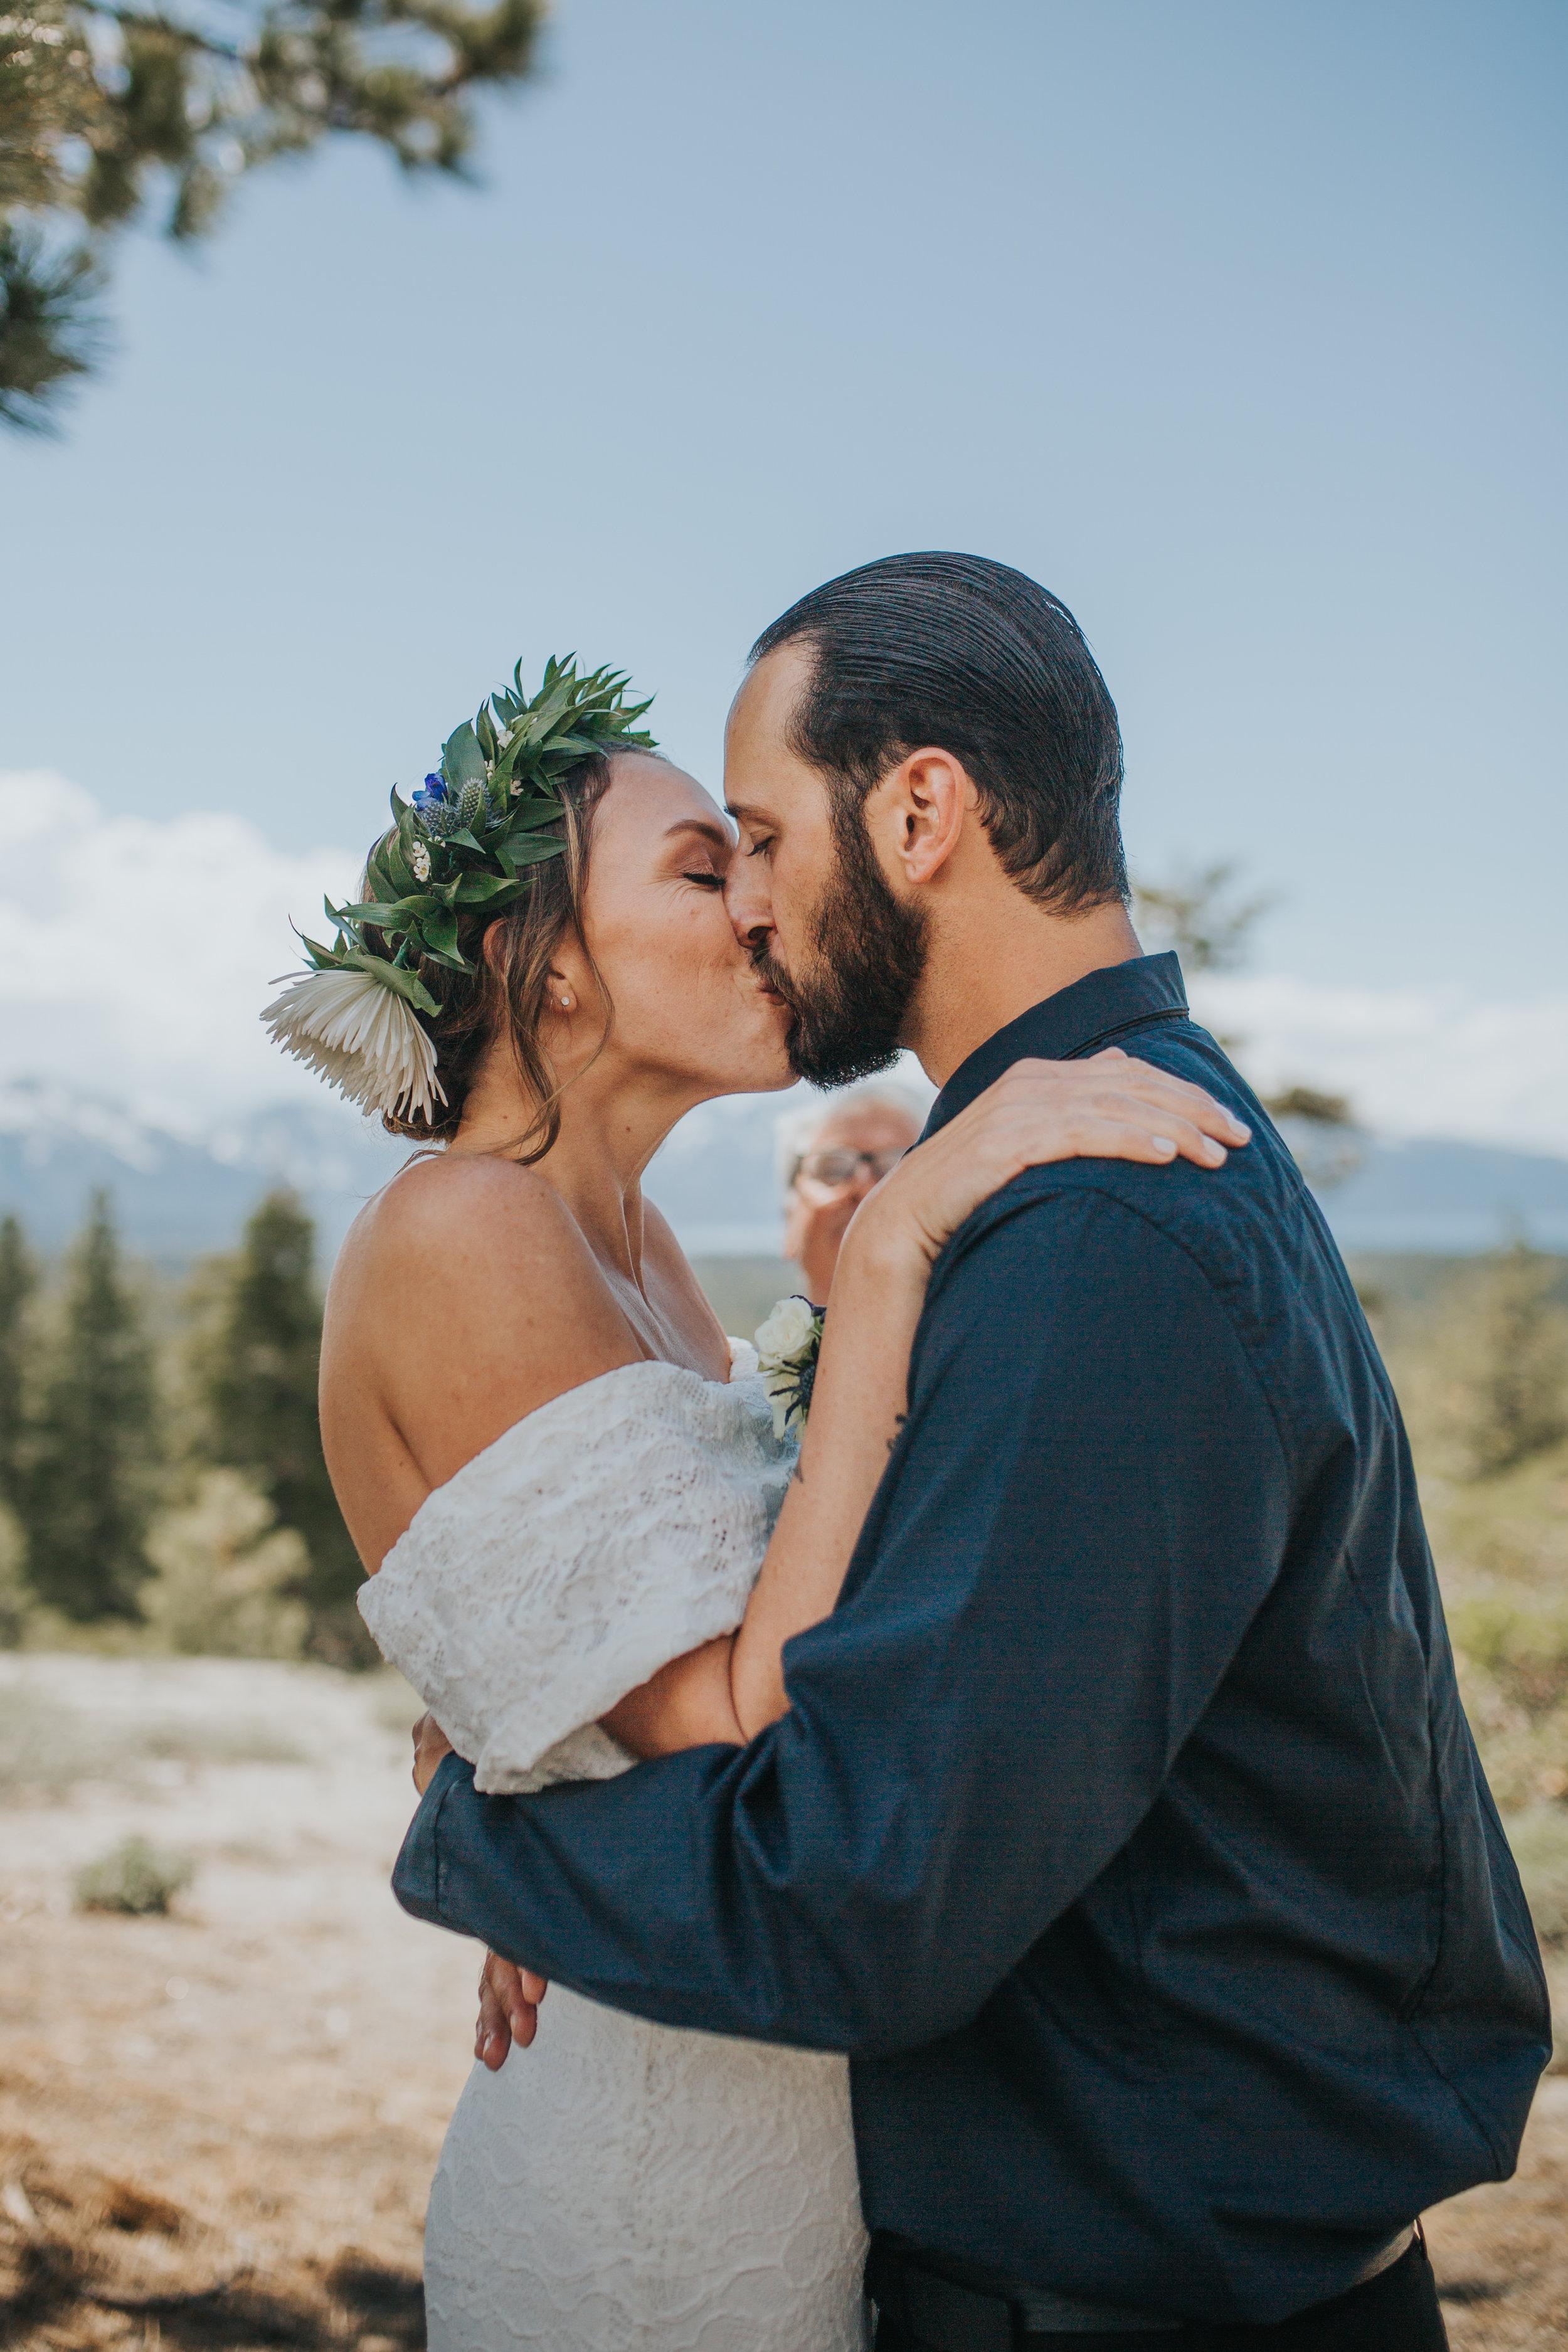 south-lake-tahoe-elopement-valerie-lendvay-photo-032.jpg